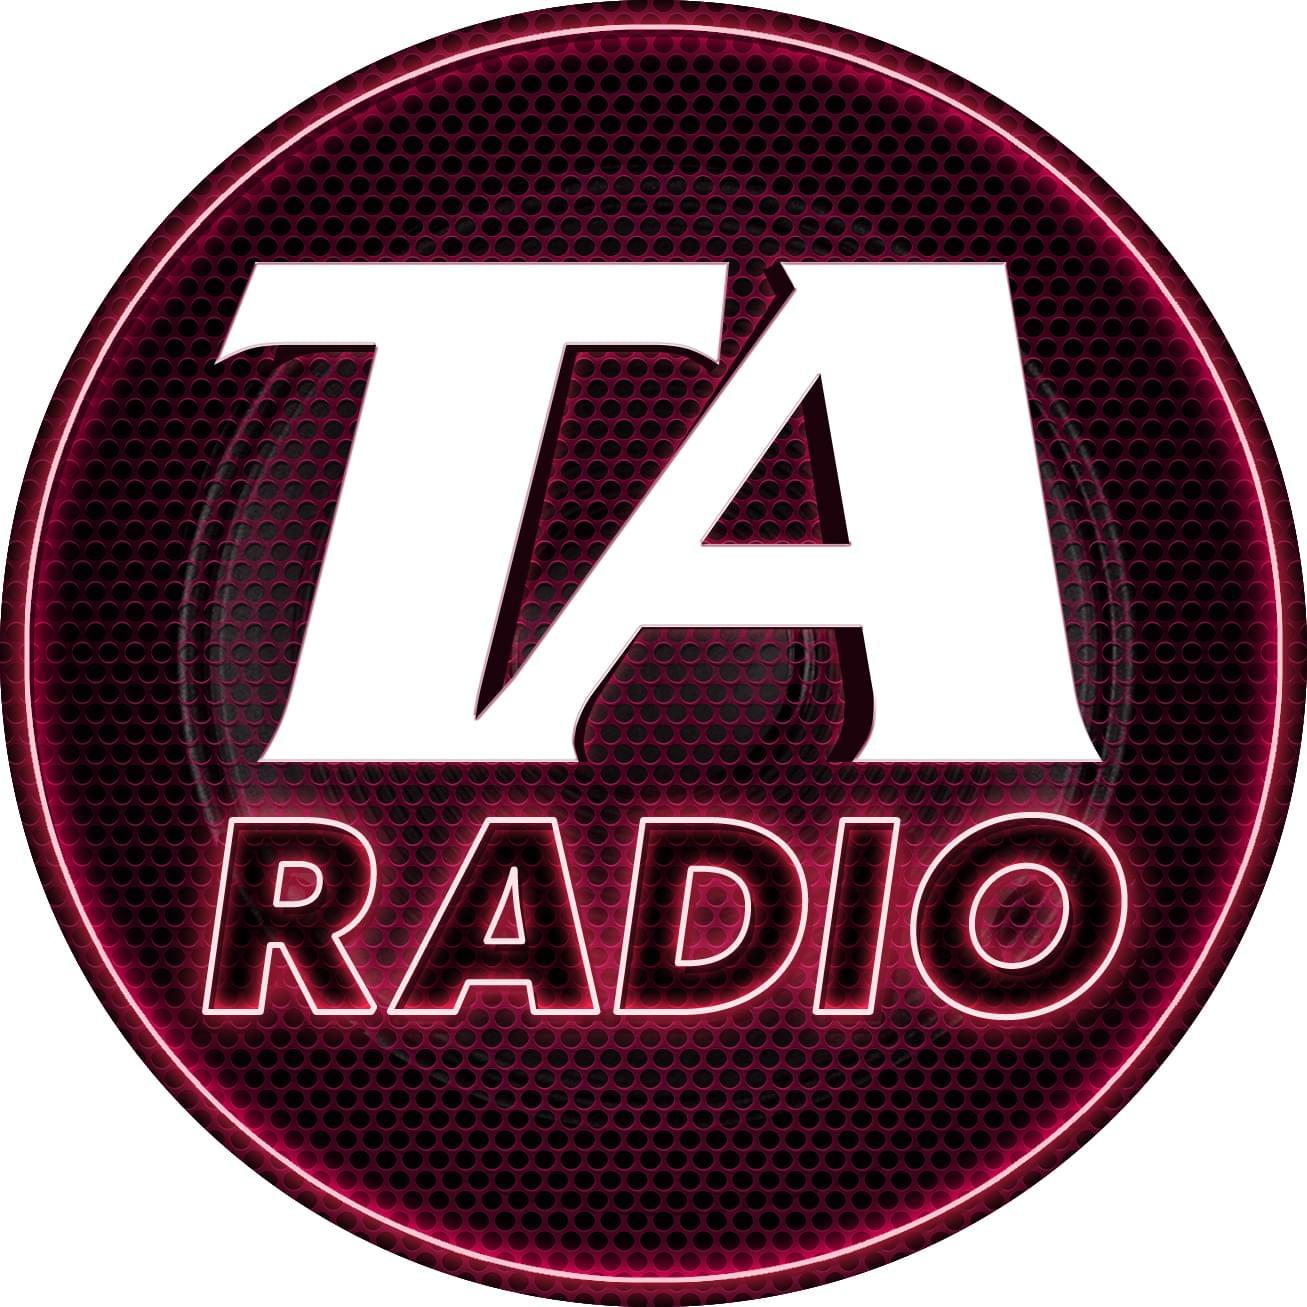 Hump It on Hump Day with TexAgs Radio!